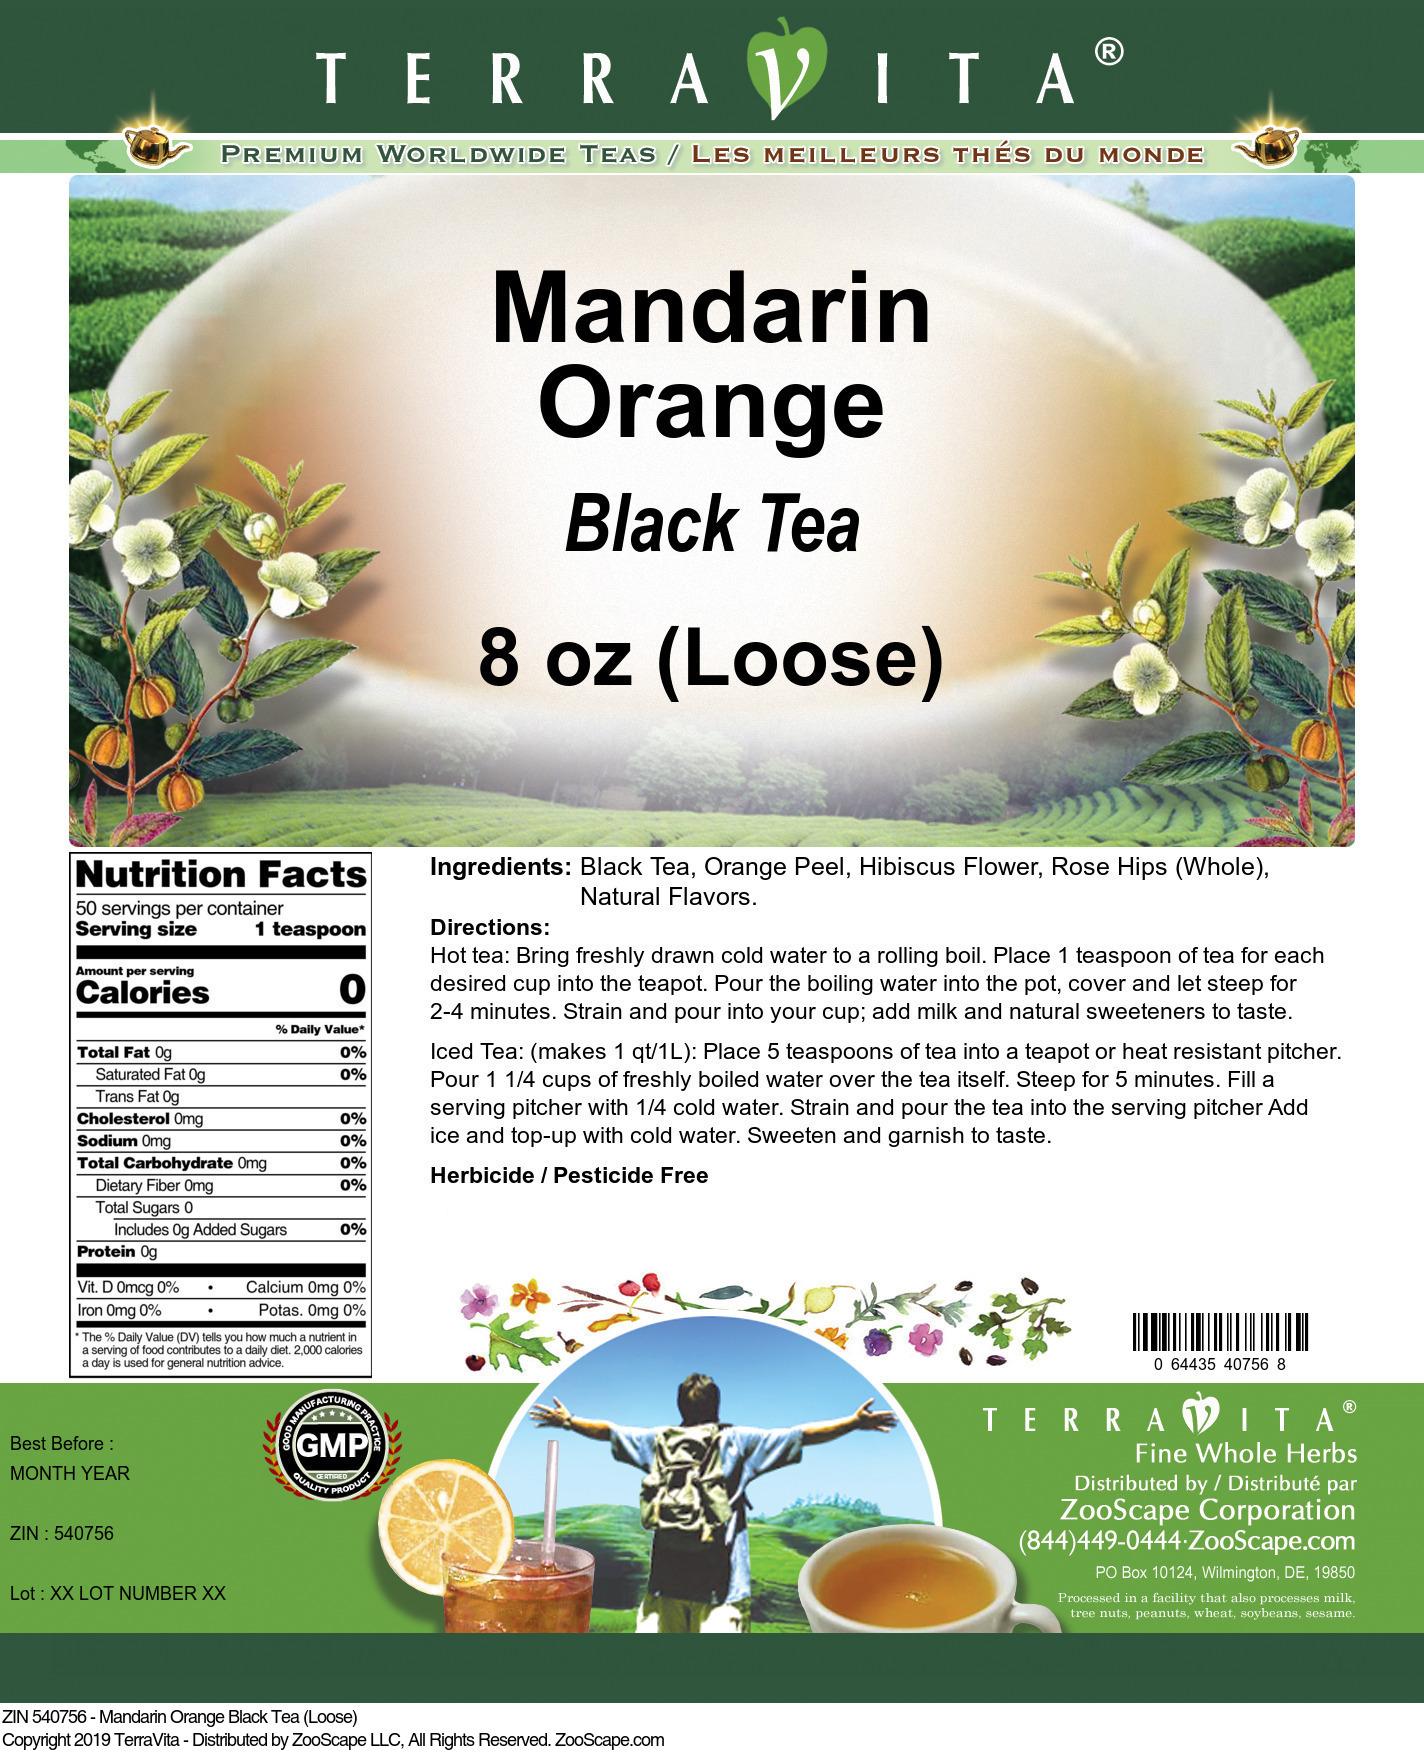 Mandarin Orange Black Tea